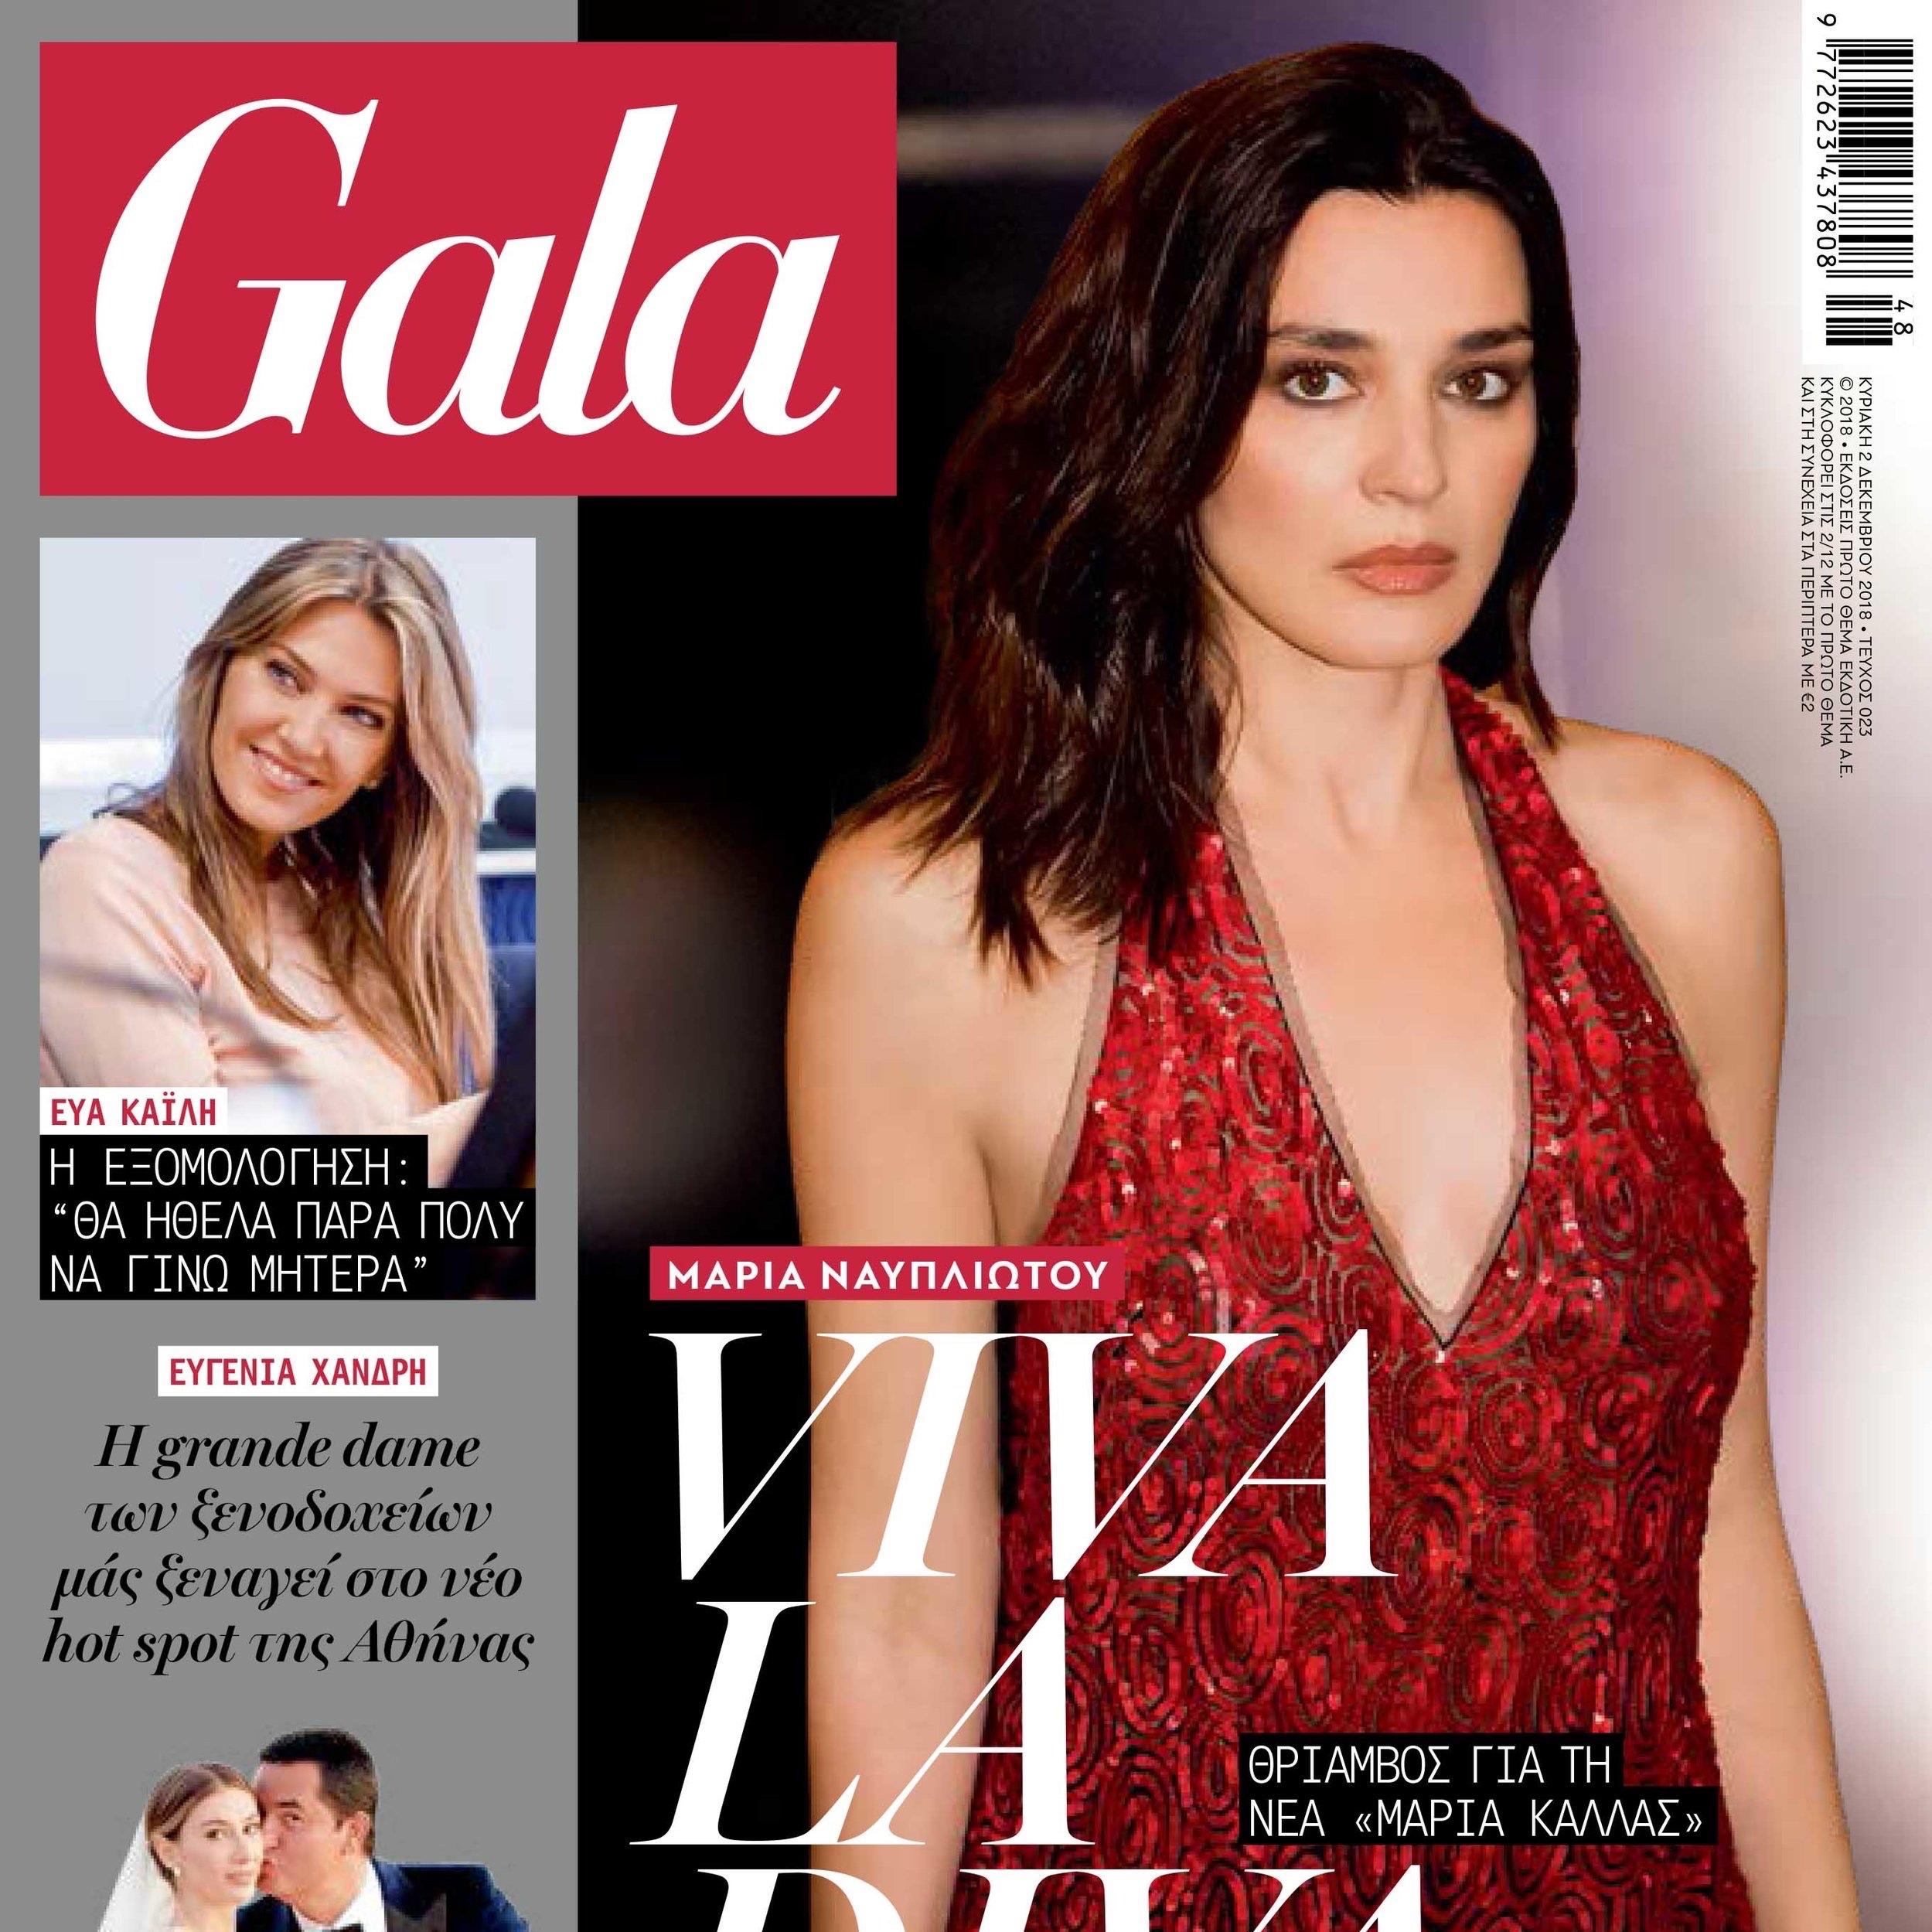 Gala Magazine November 2019